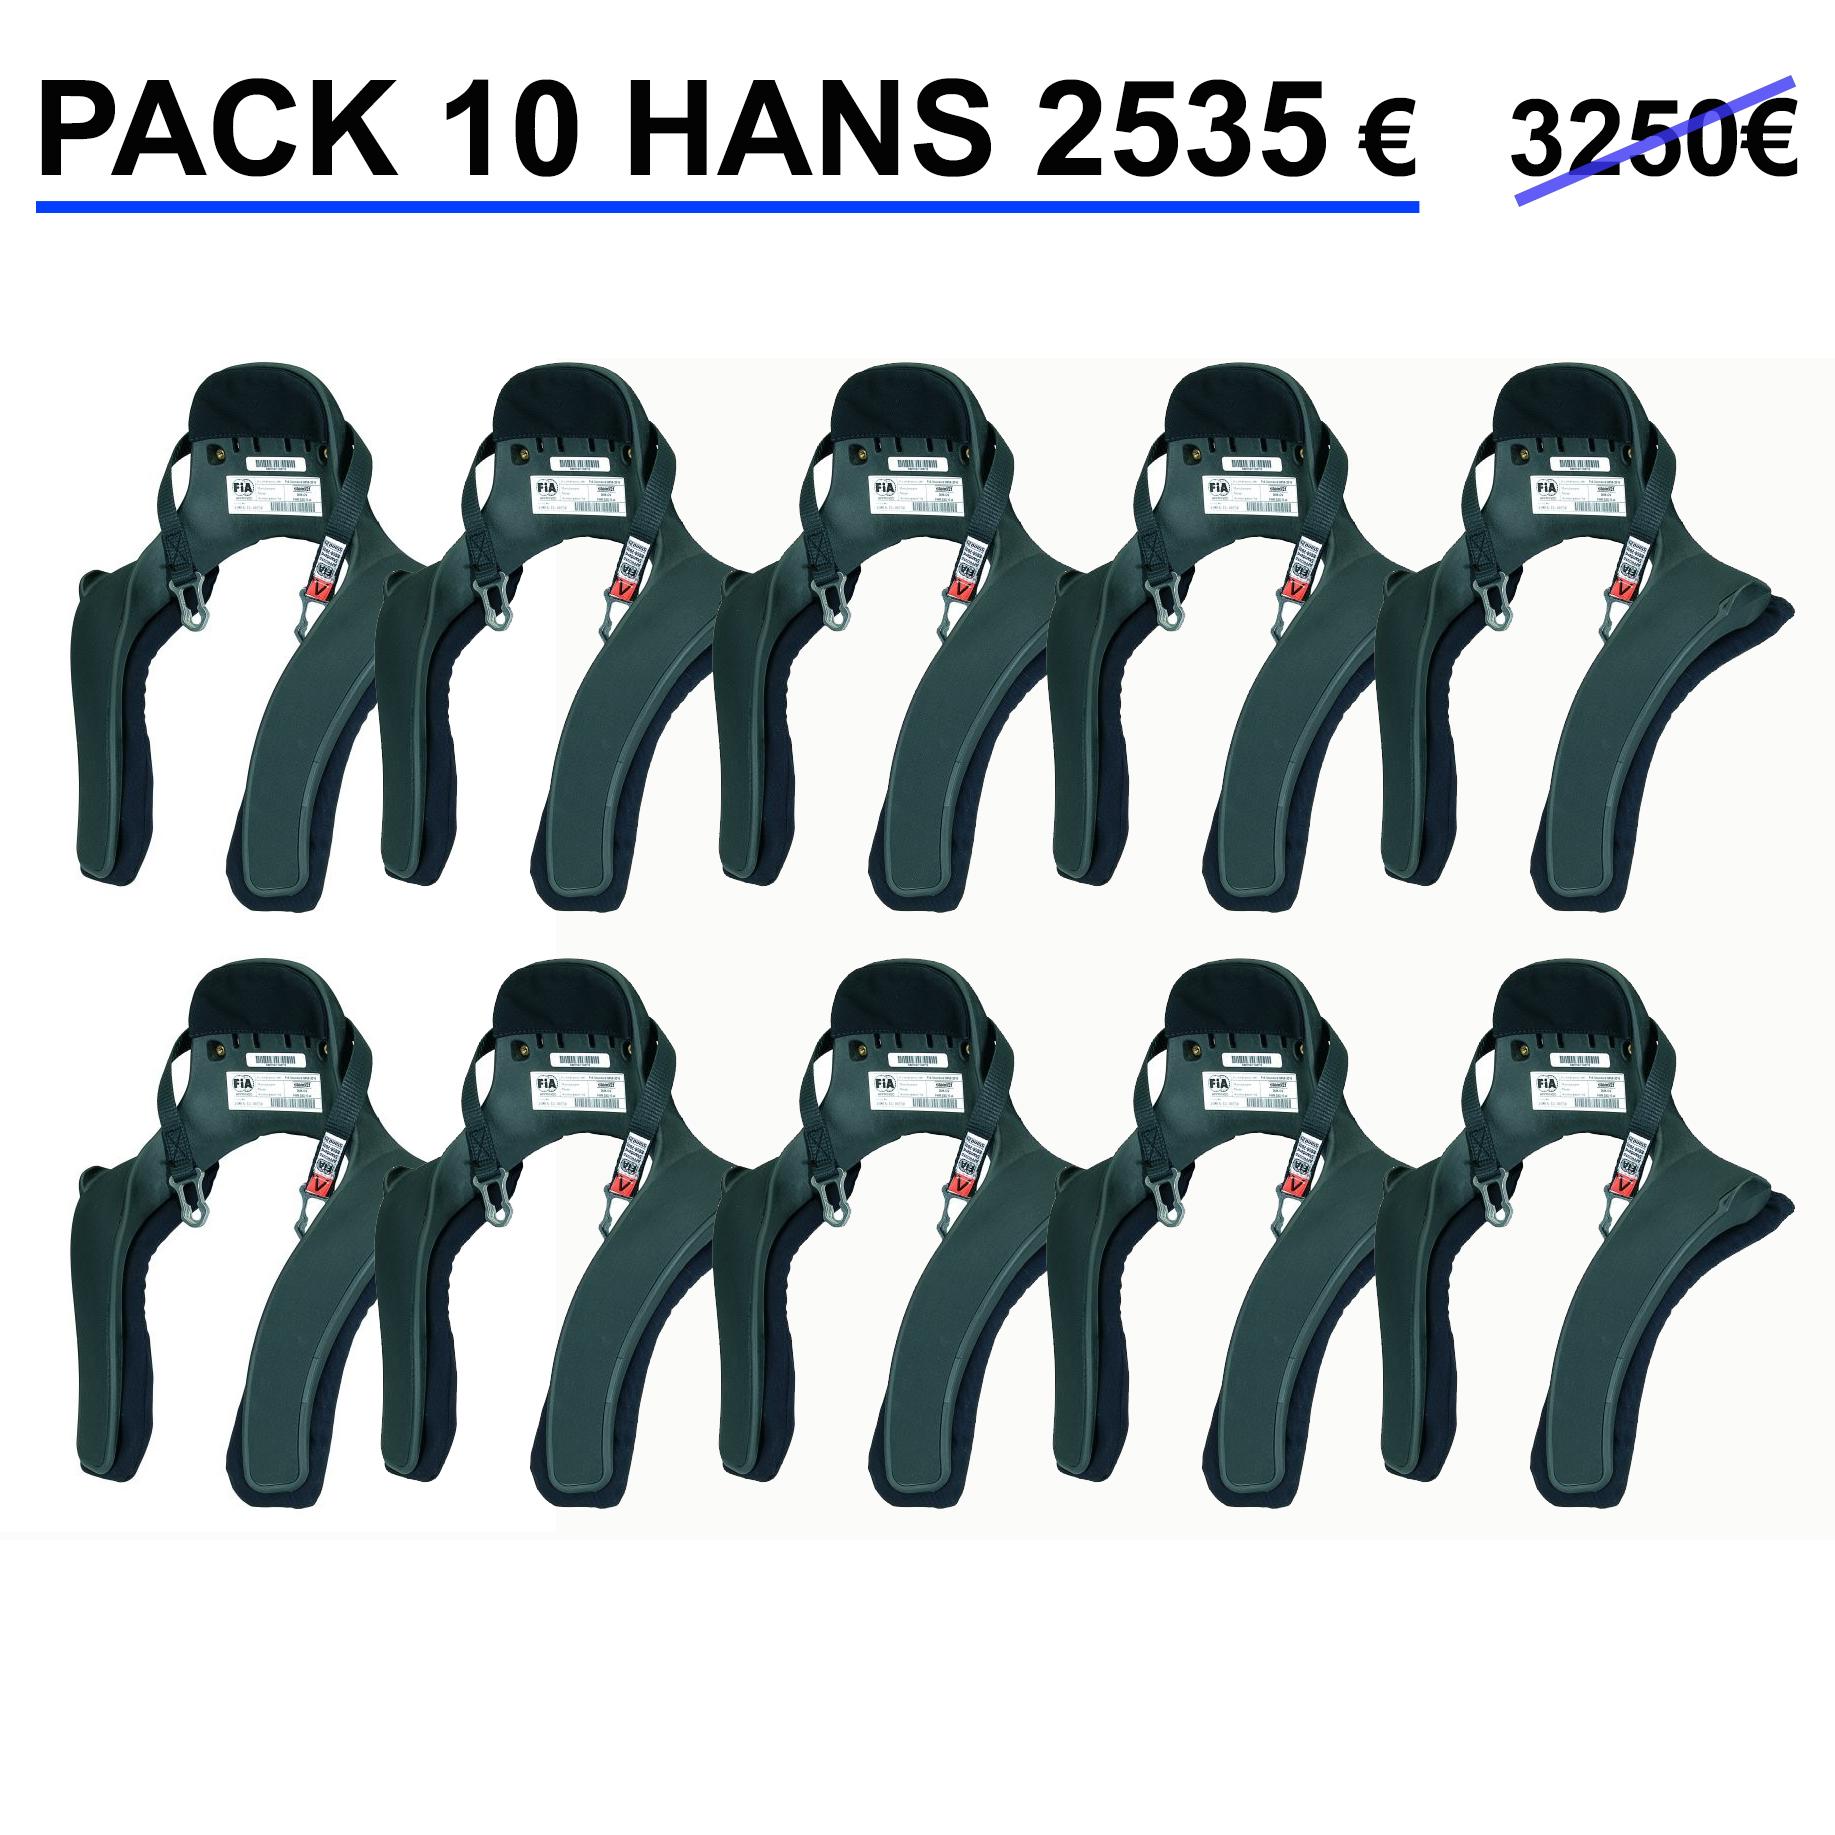 Pack 10 hans